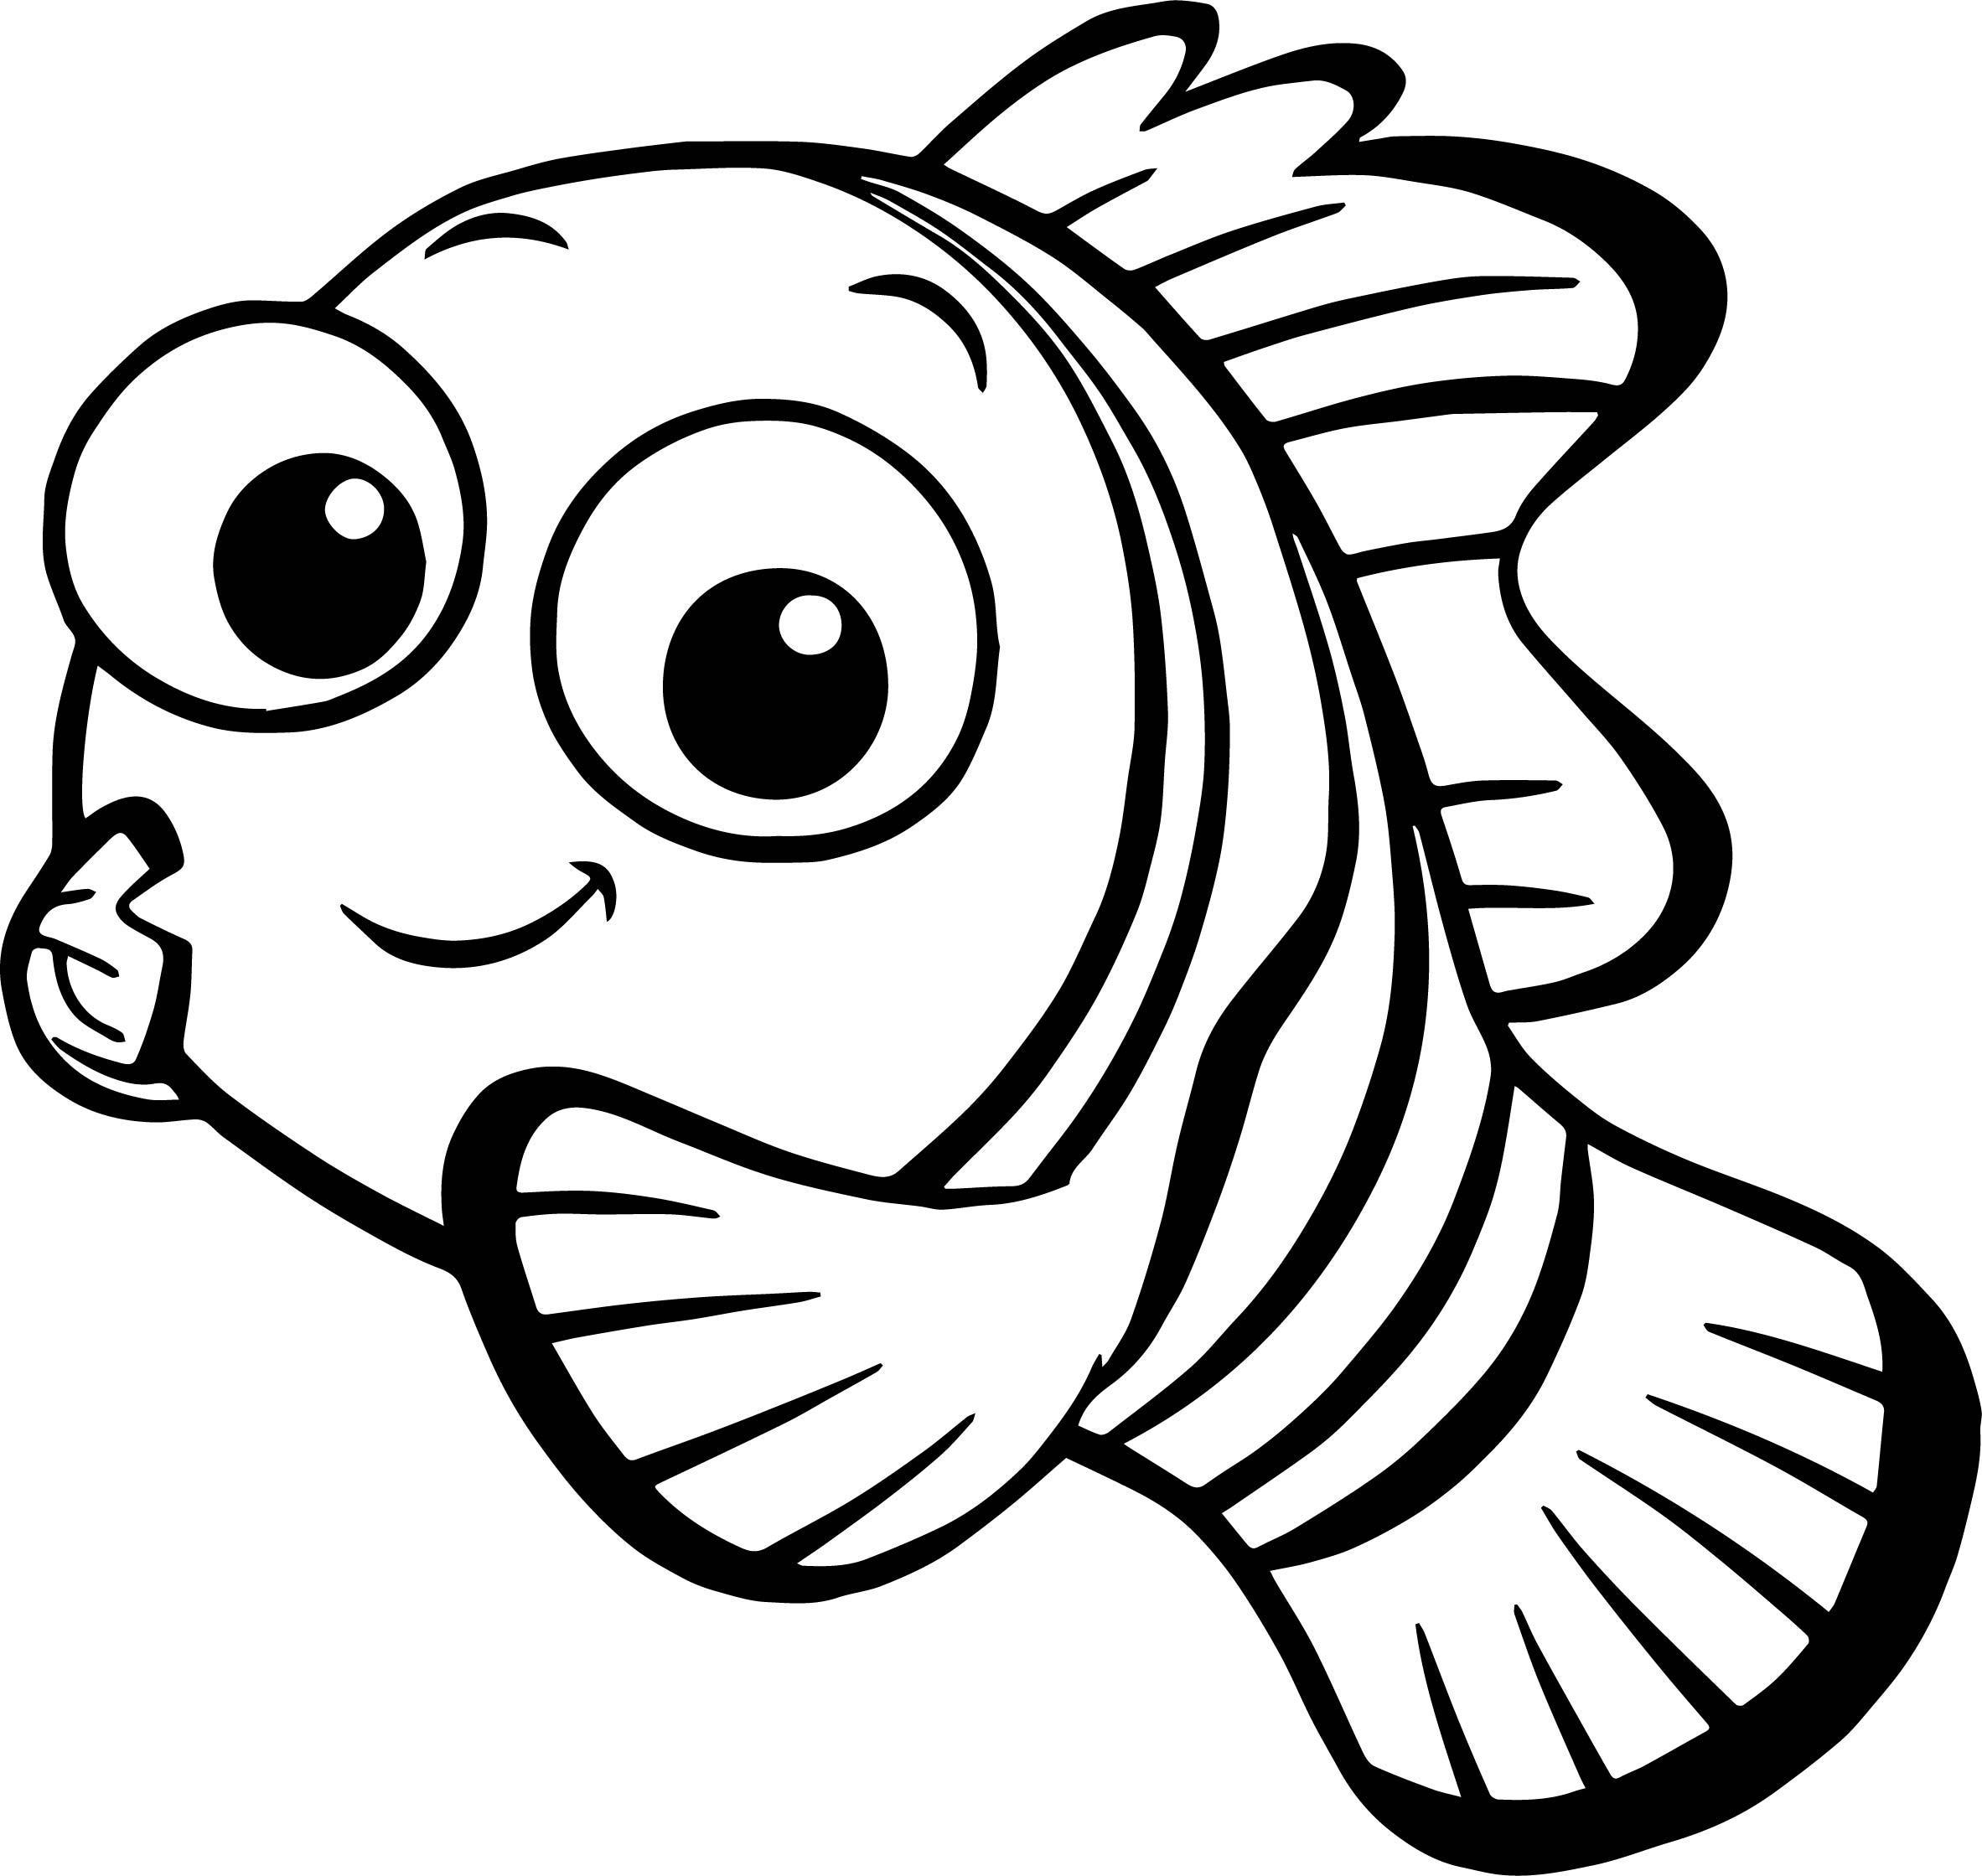 Angler fish cliparts nemo jpg freeuse download Nemo Fish Drawing at PaintingValley.com | Explore collection of Nemo ... jpg freeuse download